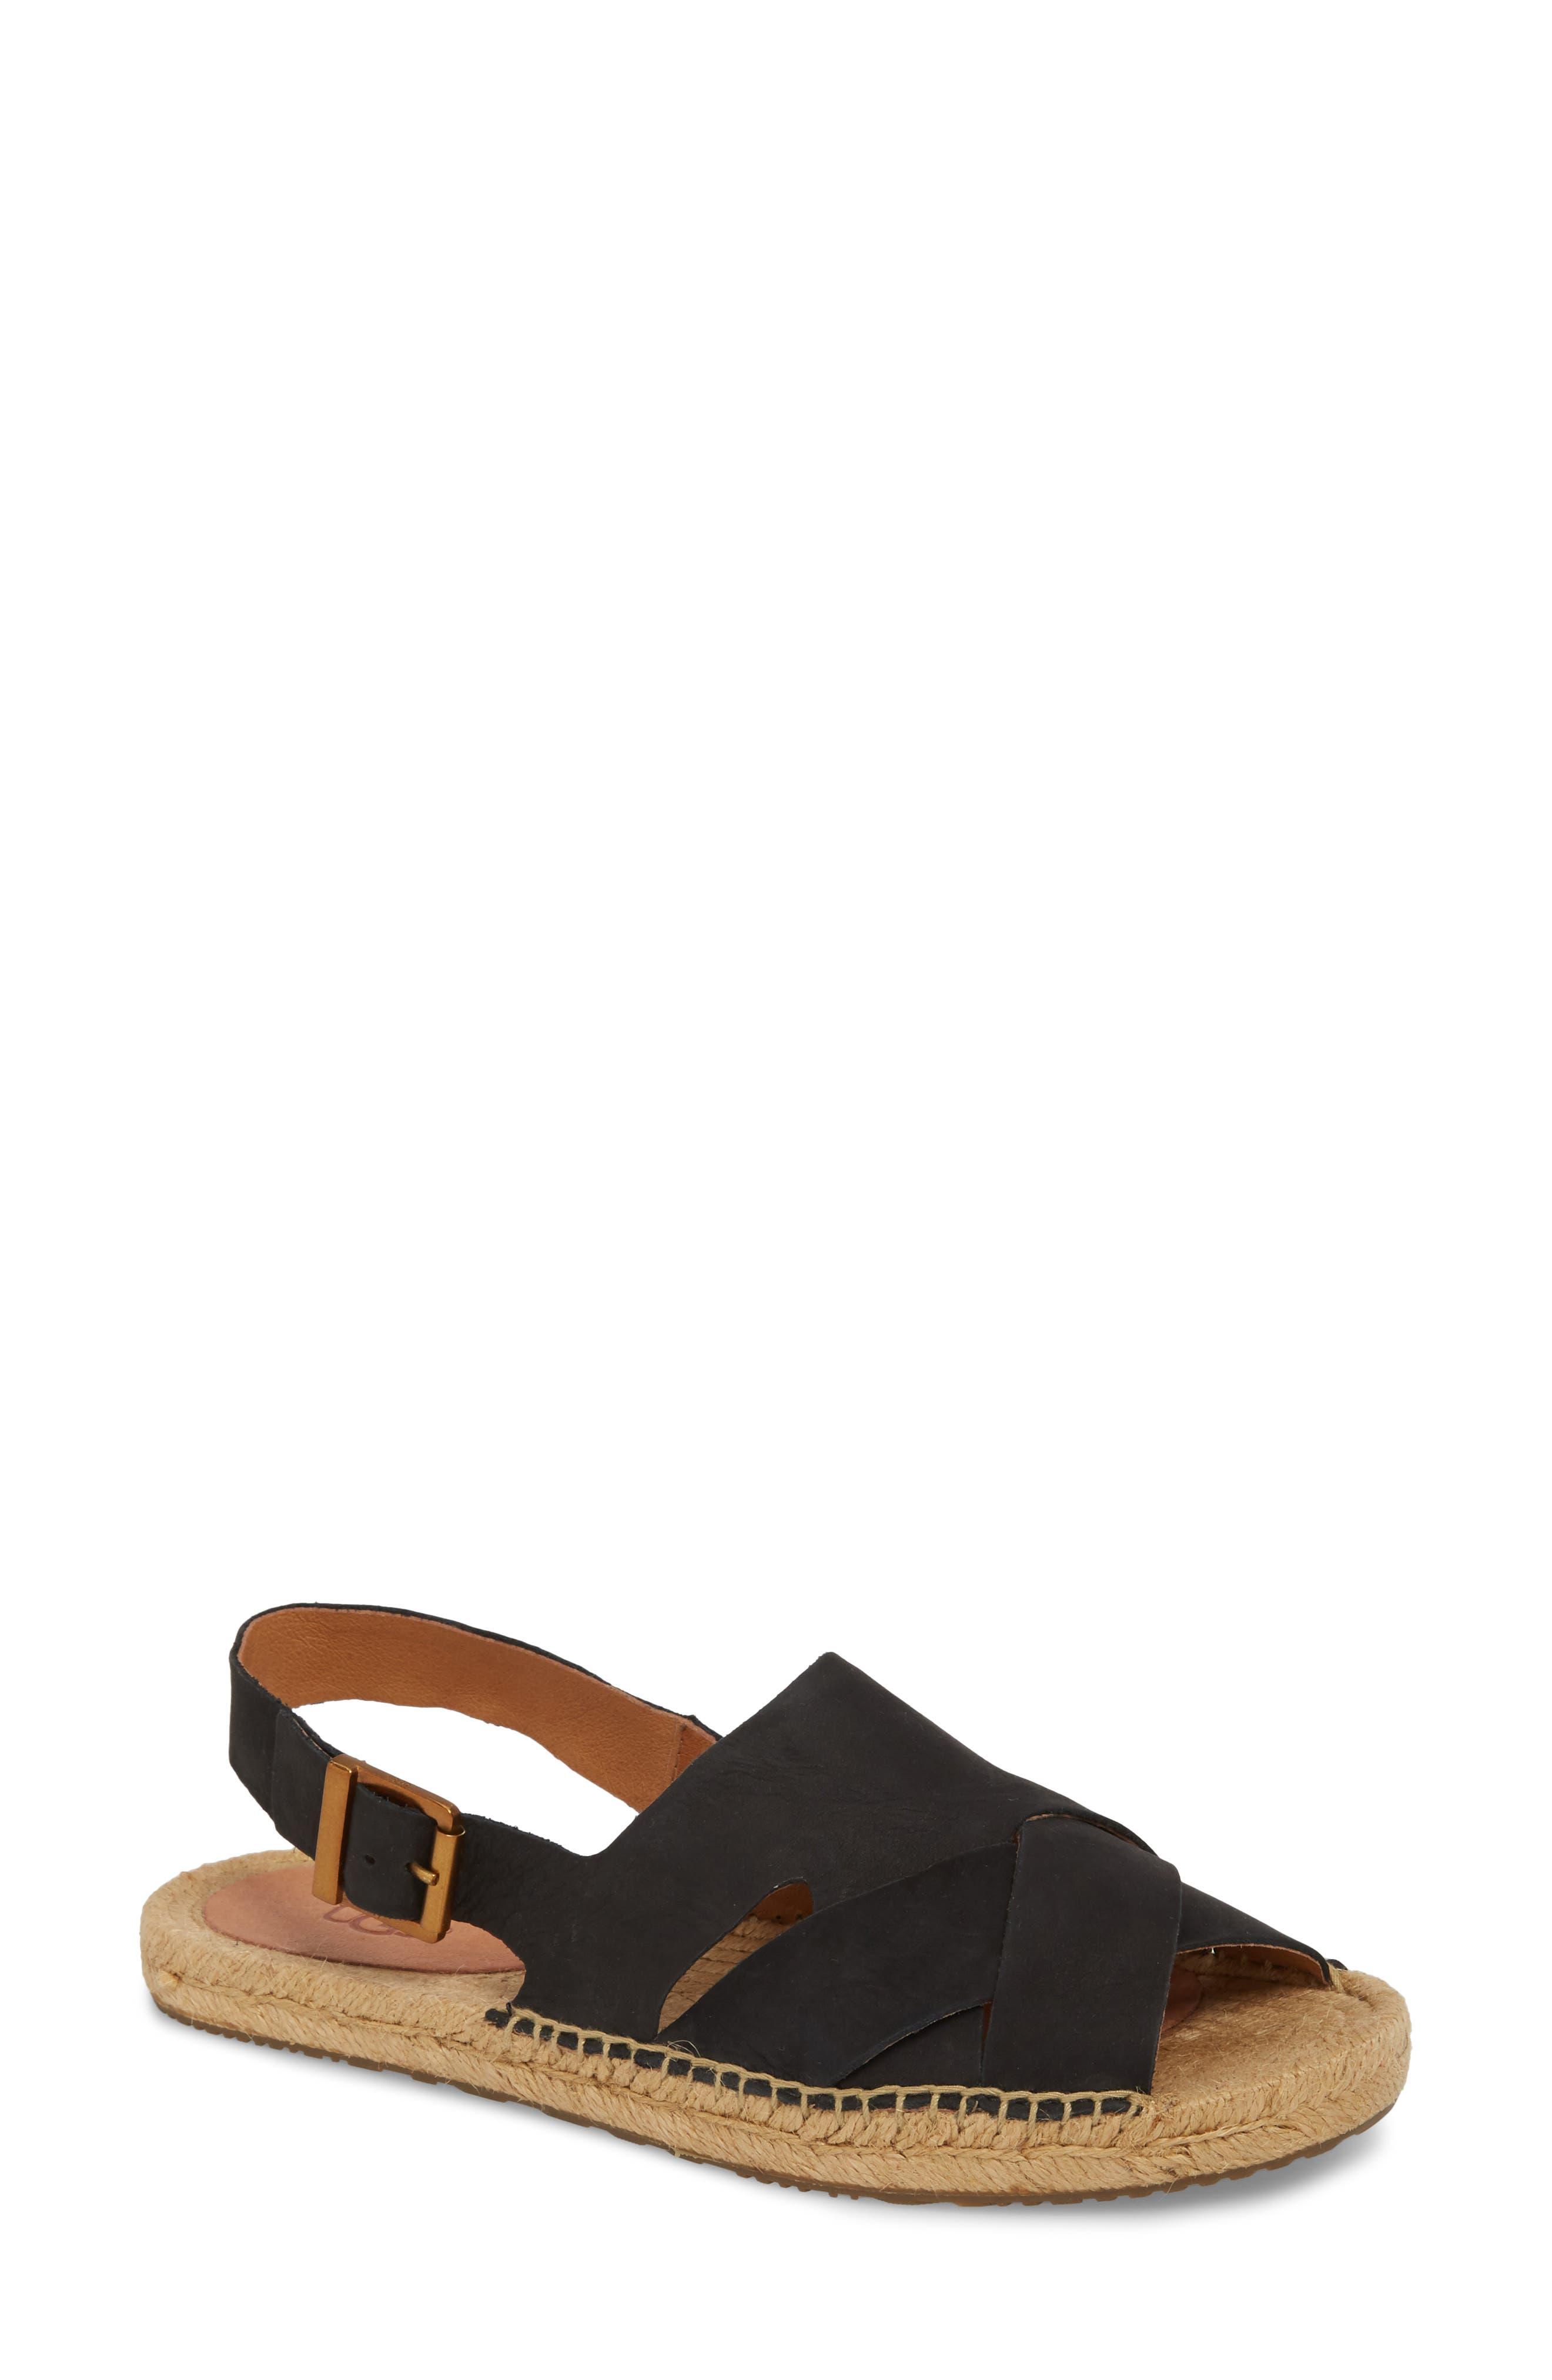 Marleah Sandal,                         Main,                         color, Black Suede